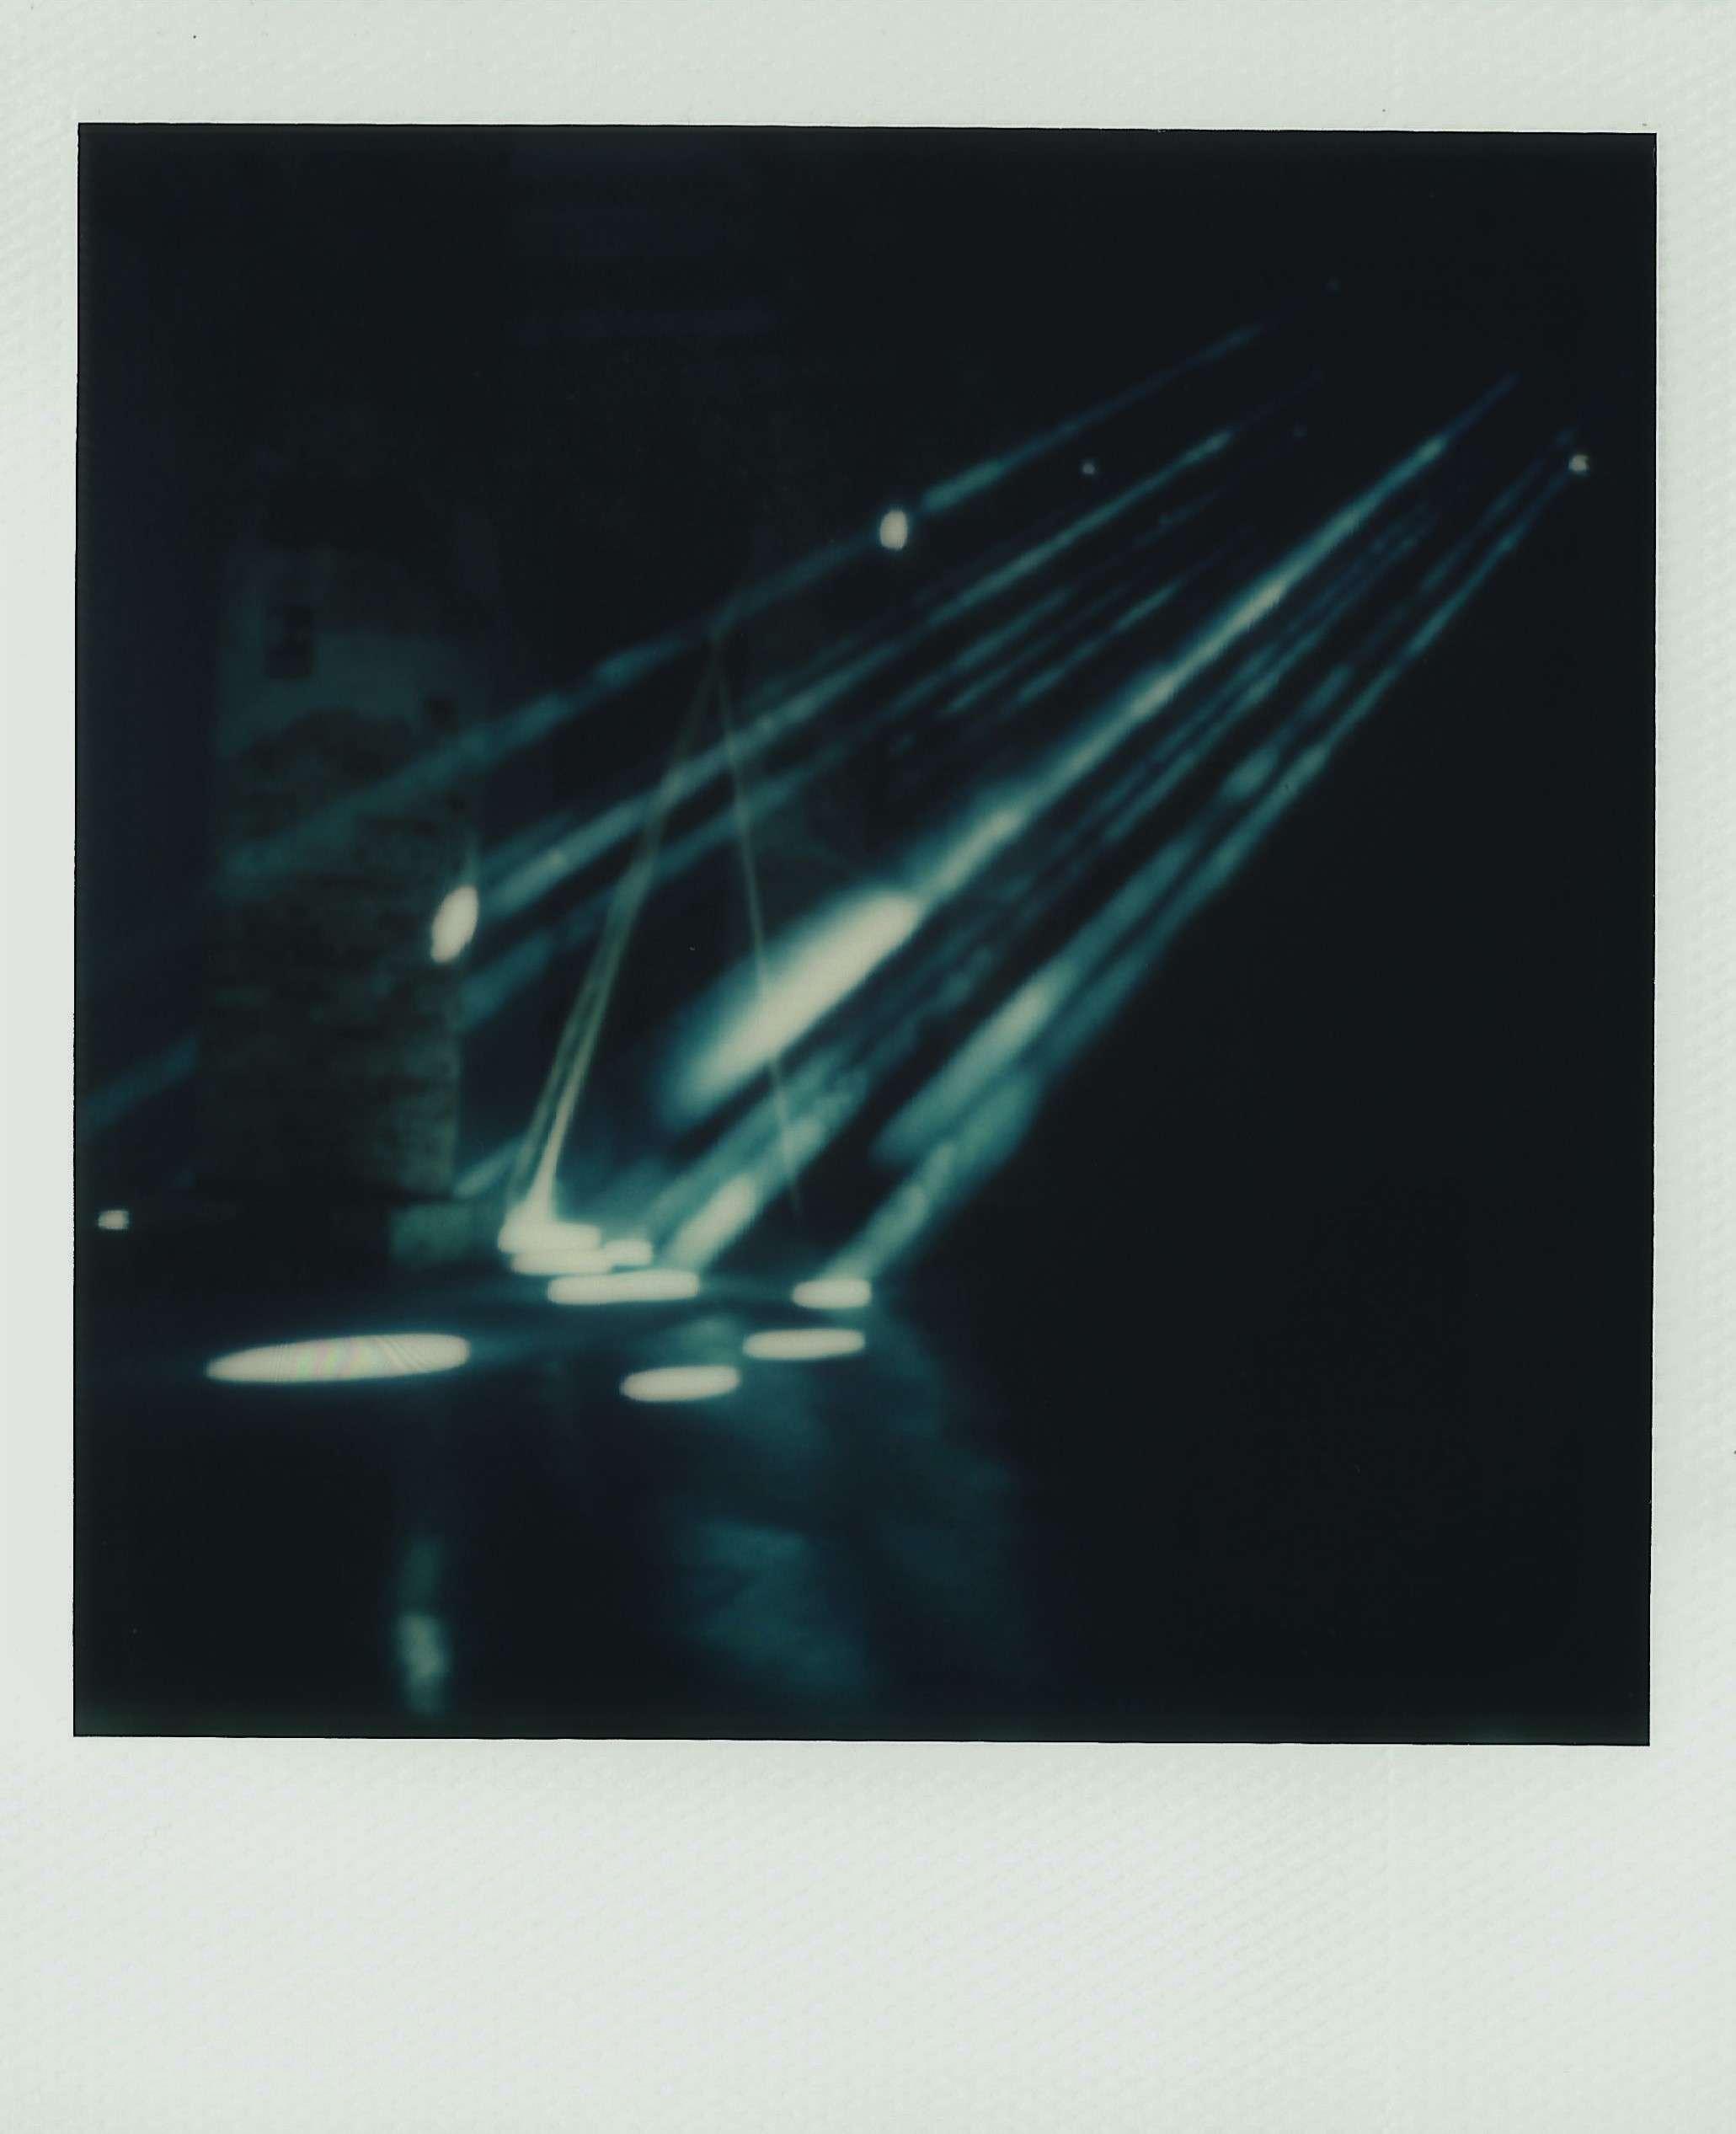 Light Holes | Polaroid SX70 | Impossible Project 70 Color | Marina Iní | @marina.ini